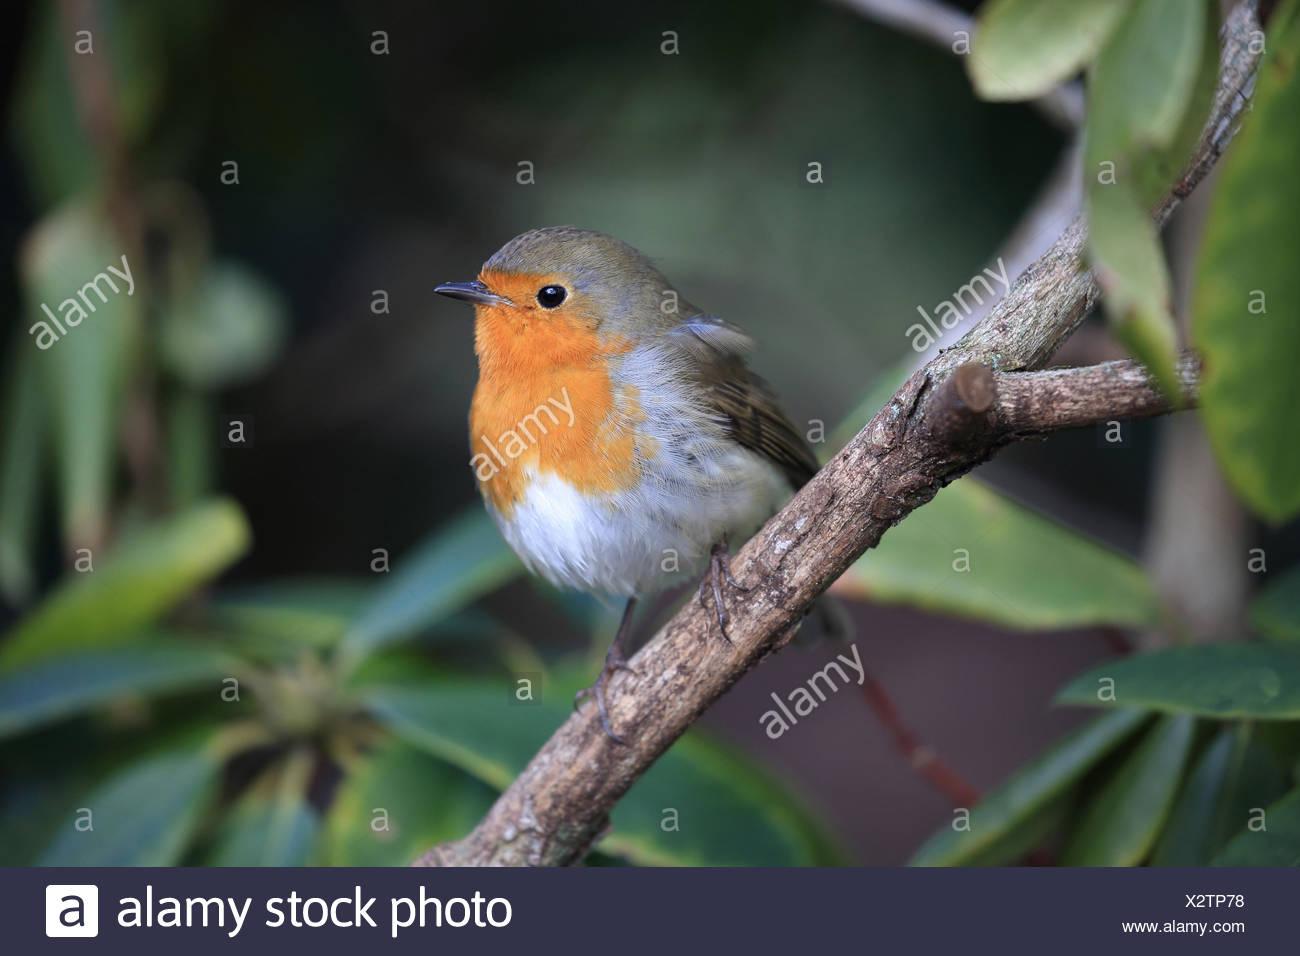 European robin, Erithacus rubecula - Stock Image